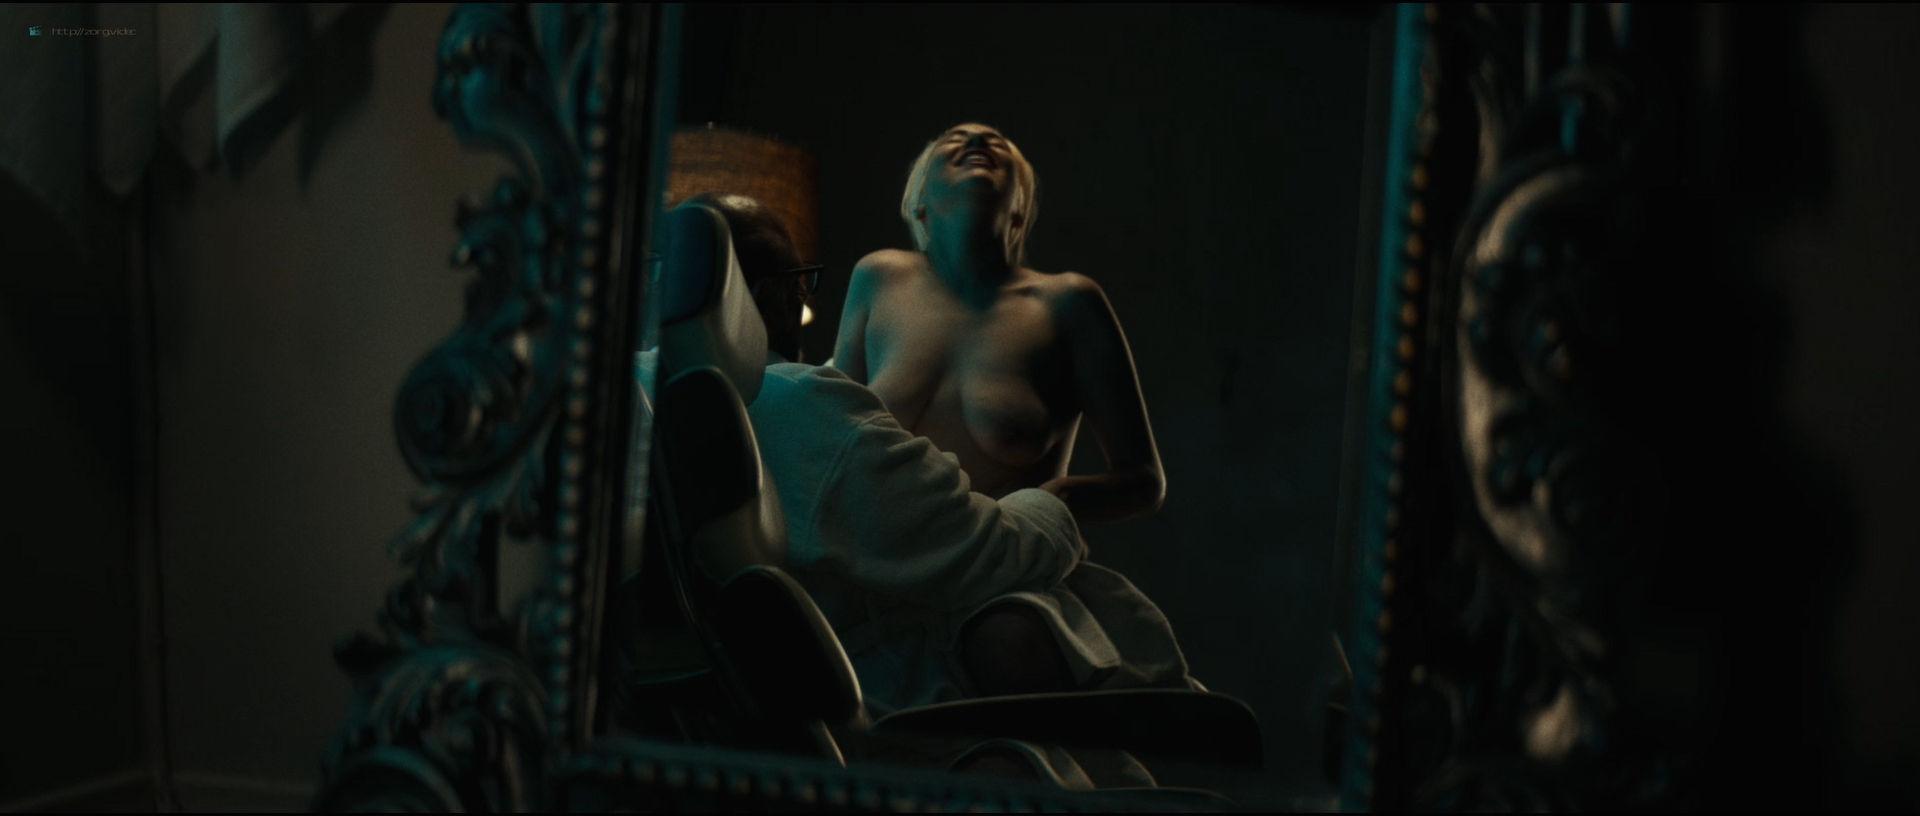 Emily Ratajkowski hot sideboob - Lying and Stealing (2019) 1080p WEB (14)